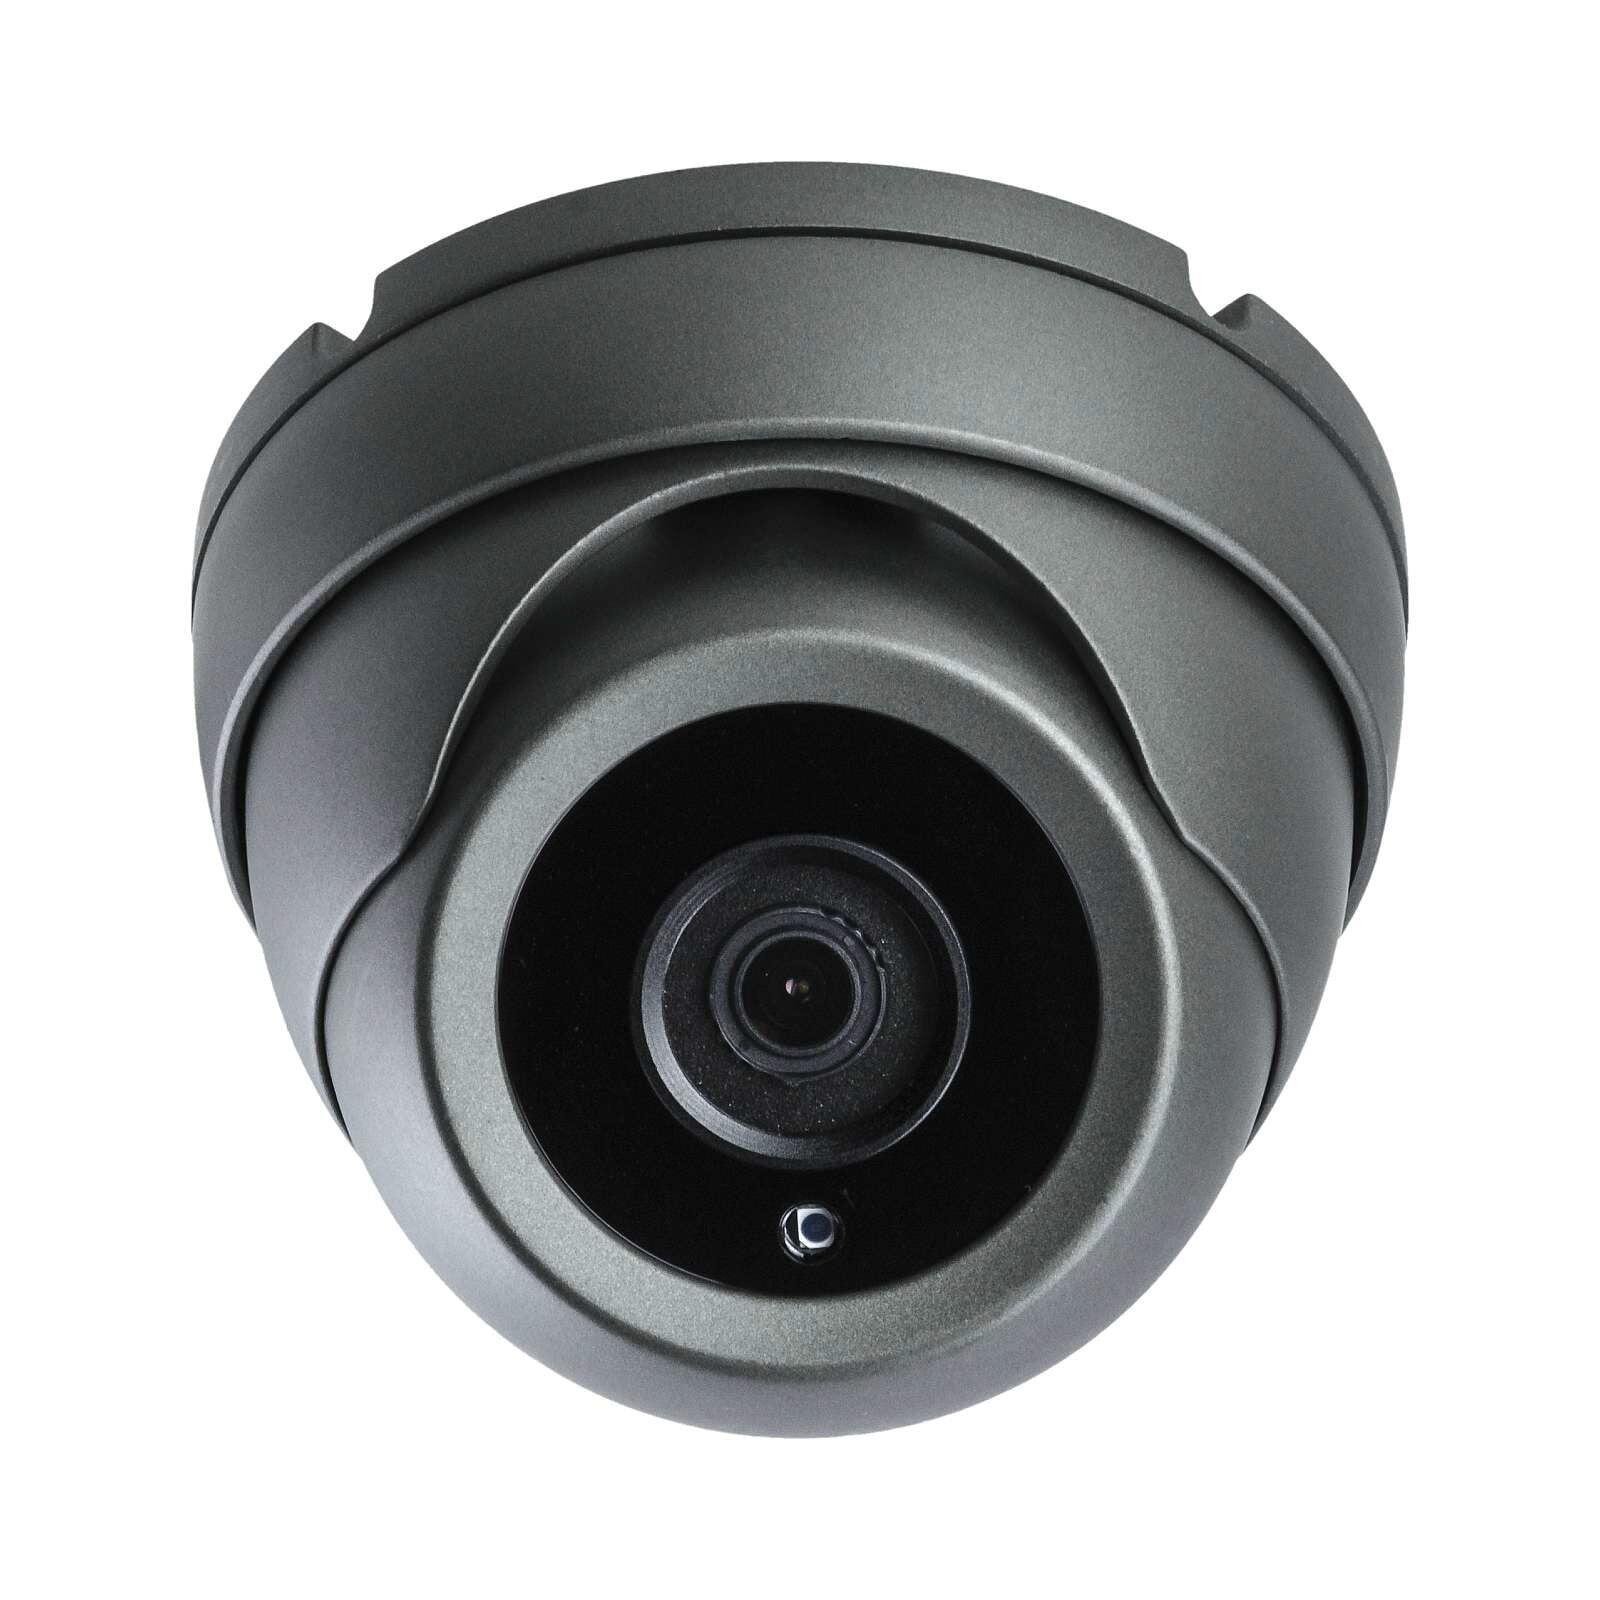 TIB-MB4332V HD-TVI 4MP 4-in-1 Eyeball Camera with 2COB IR, Motorized Lens, DC12V